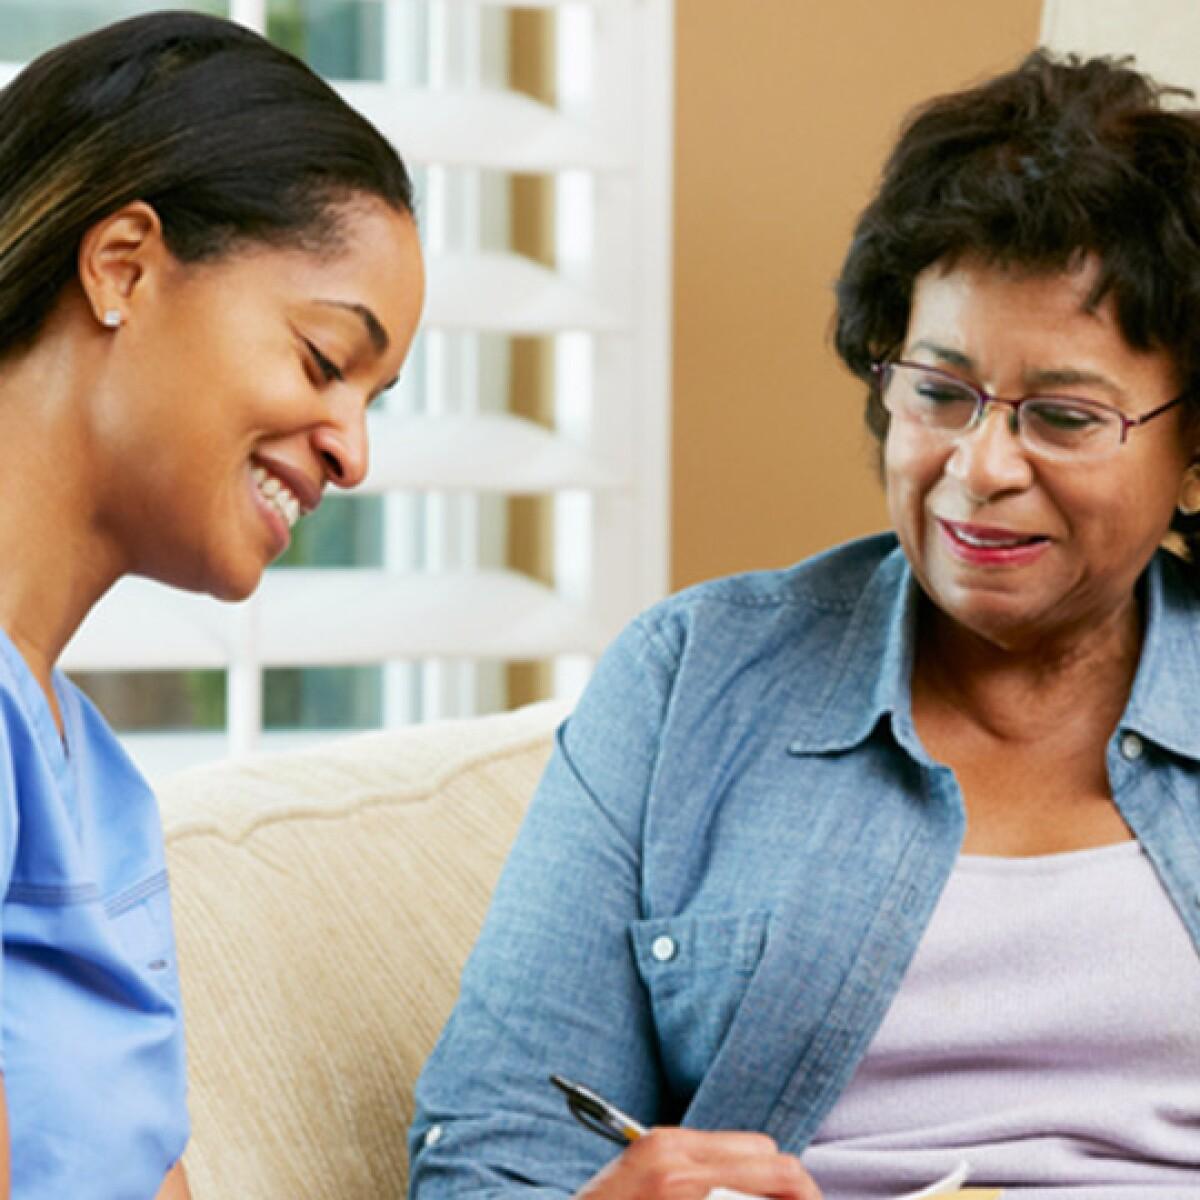 Kidney Transplant Technology: The Role of Nurses